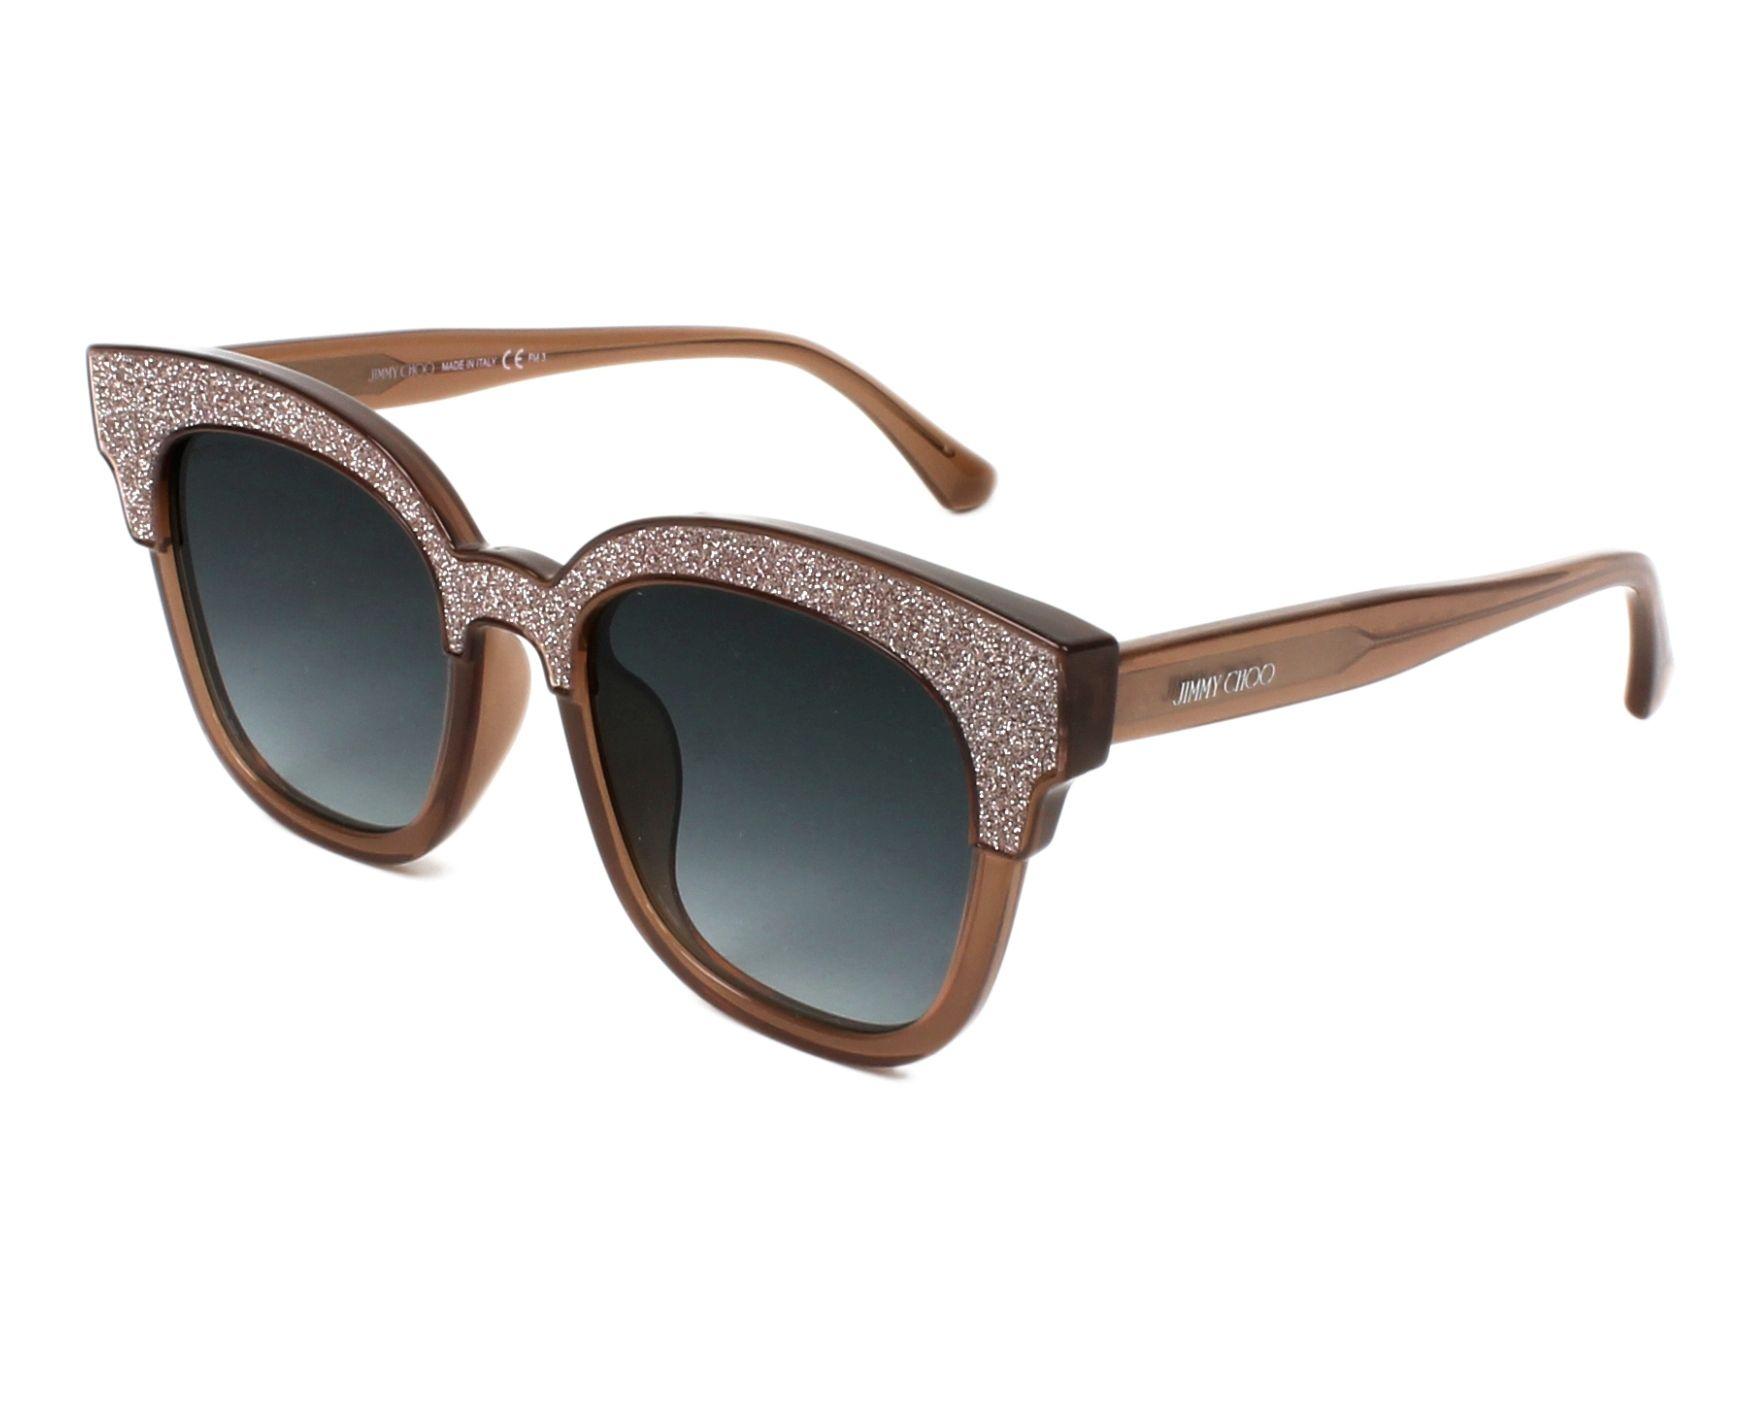 6ab98312bf2 Sunglasses Jimmy Choo MAYELA-S 18U VH 50-19 Silver Beige profile view